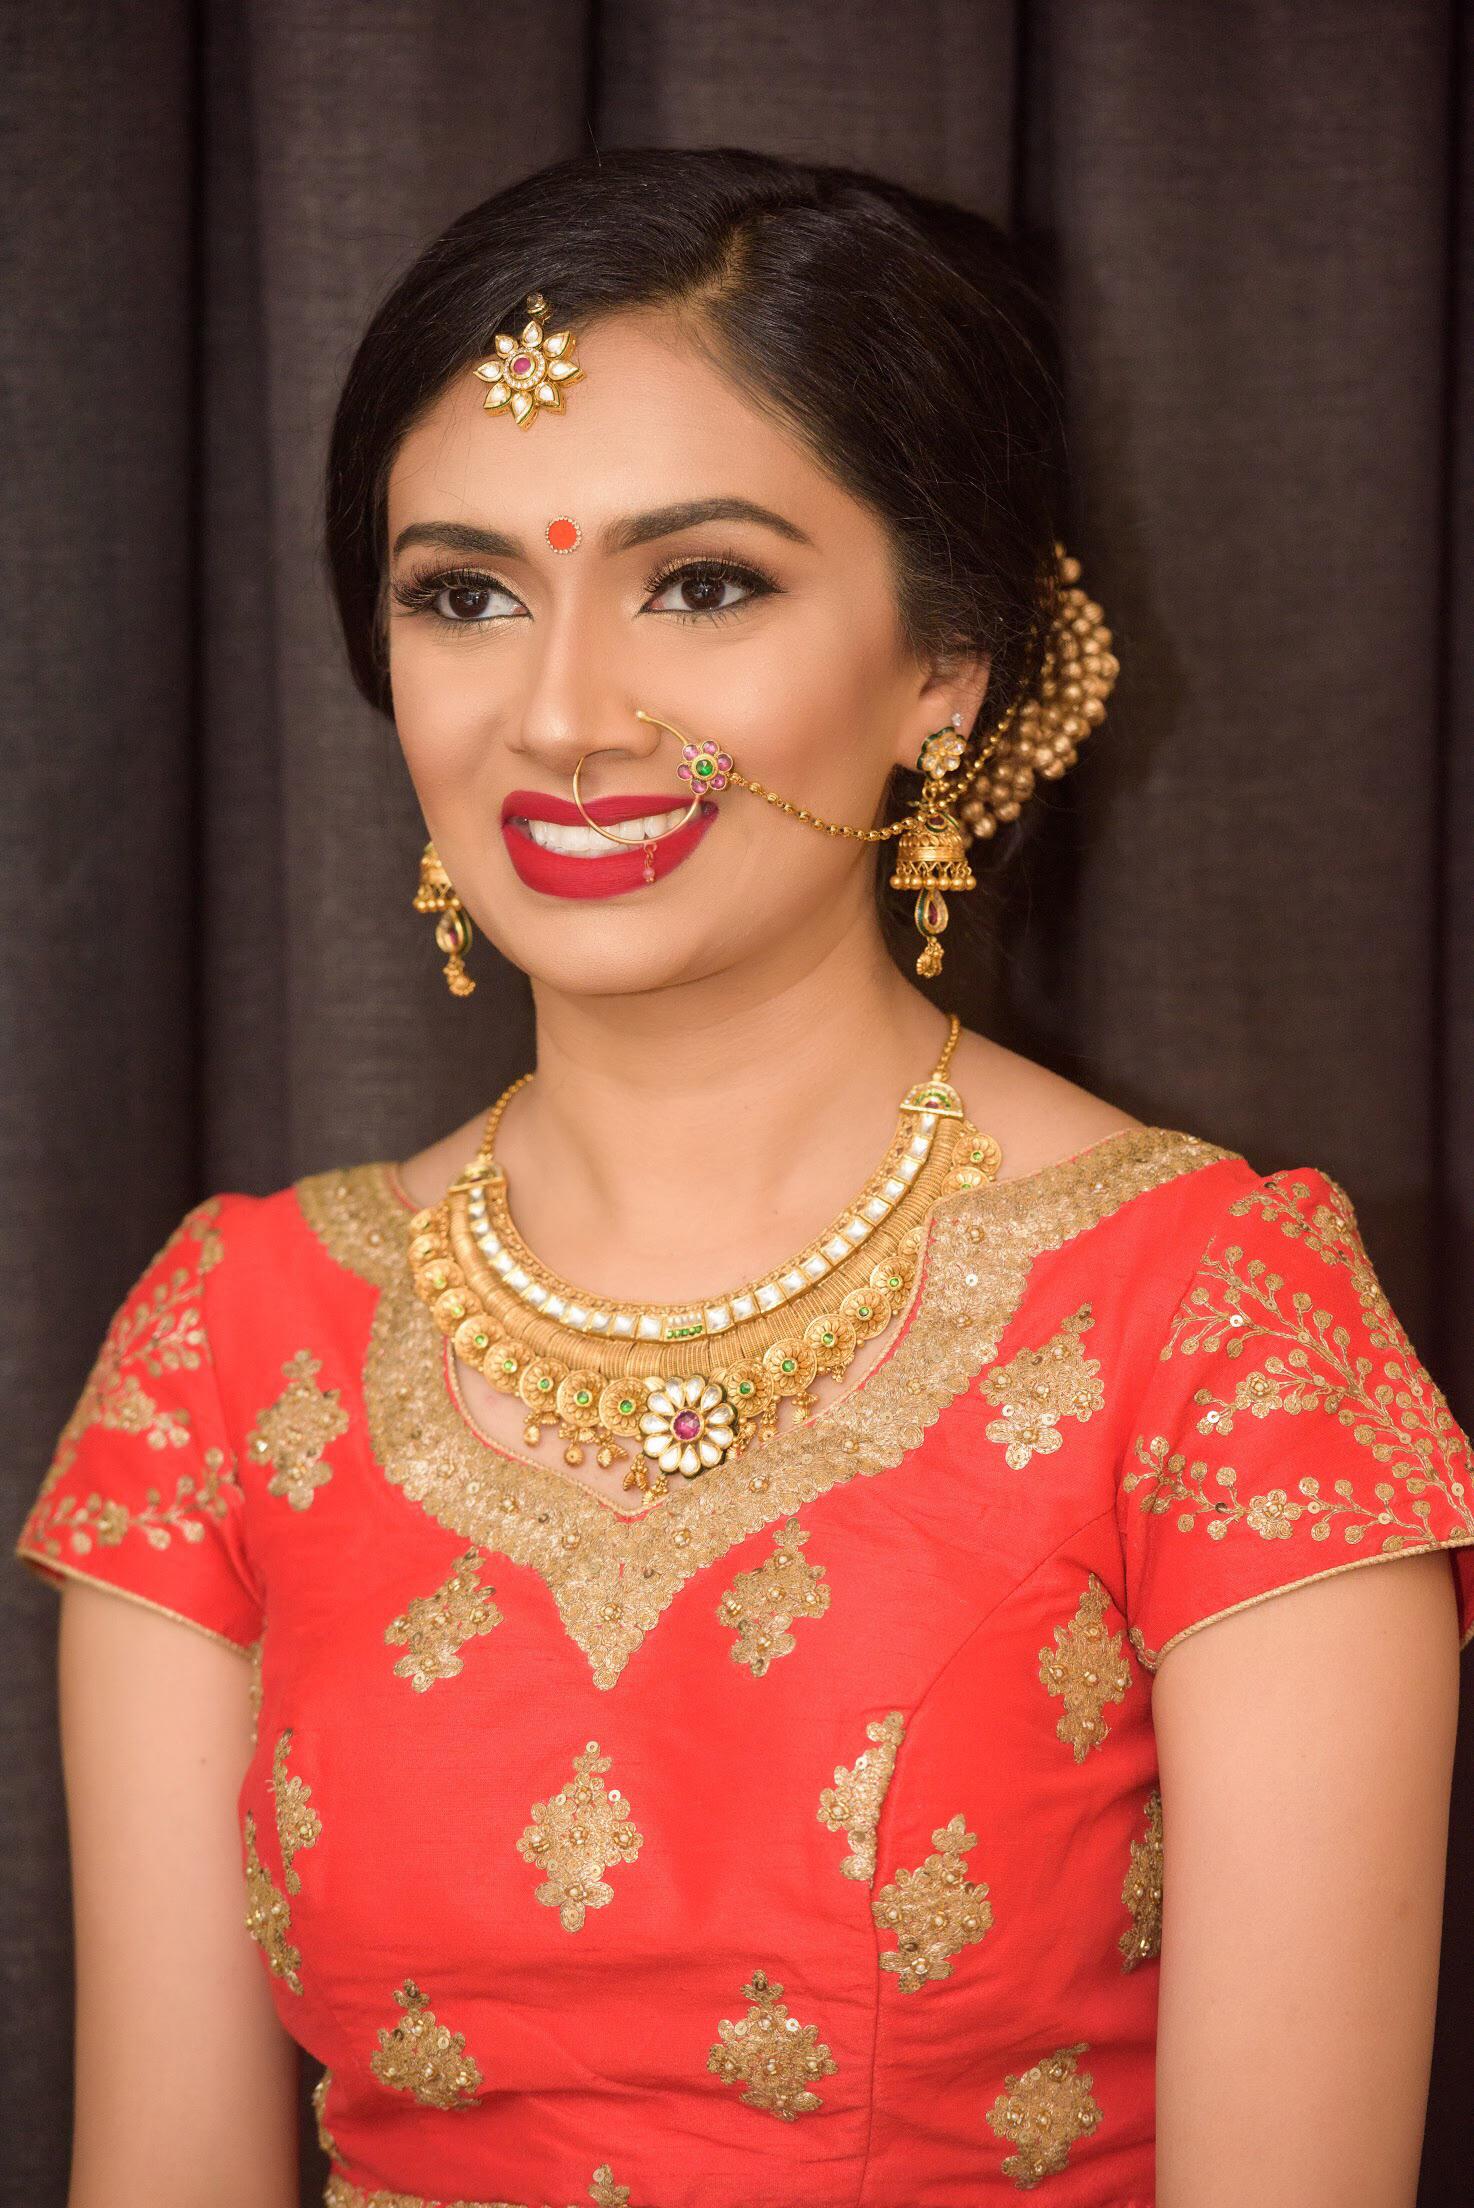 Tina Shah Wedding And Reception Portraits